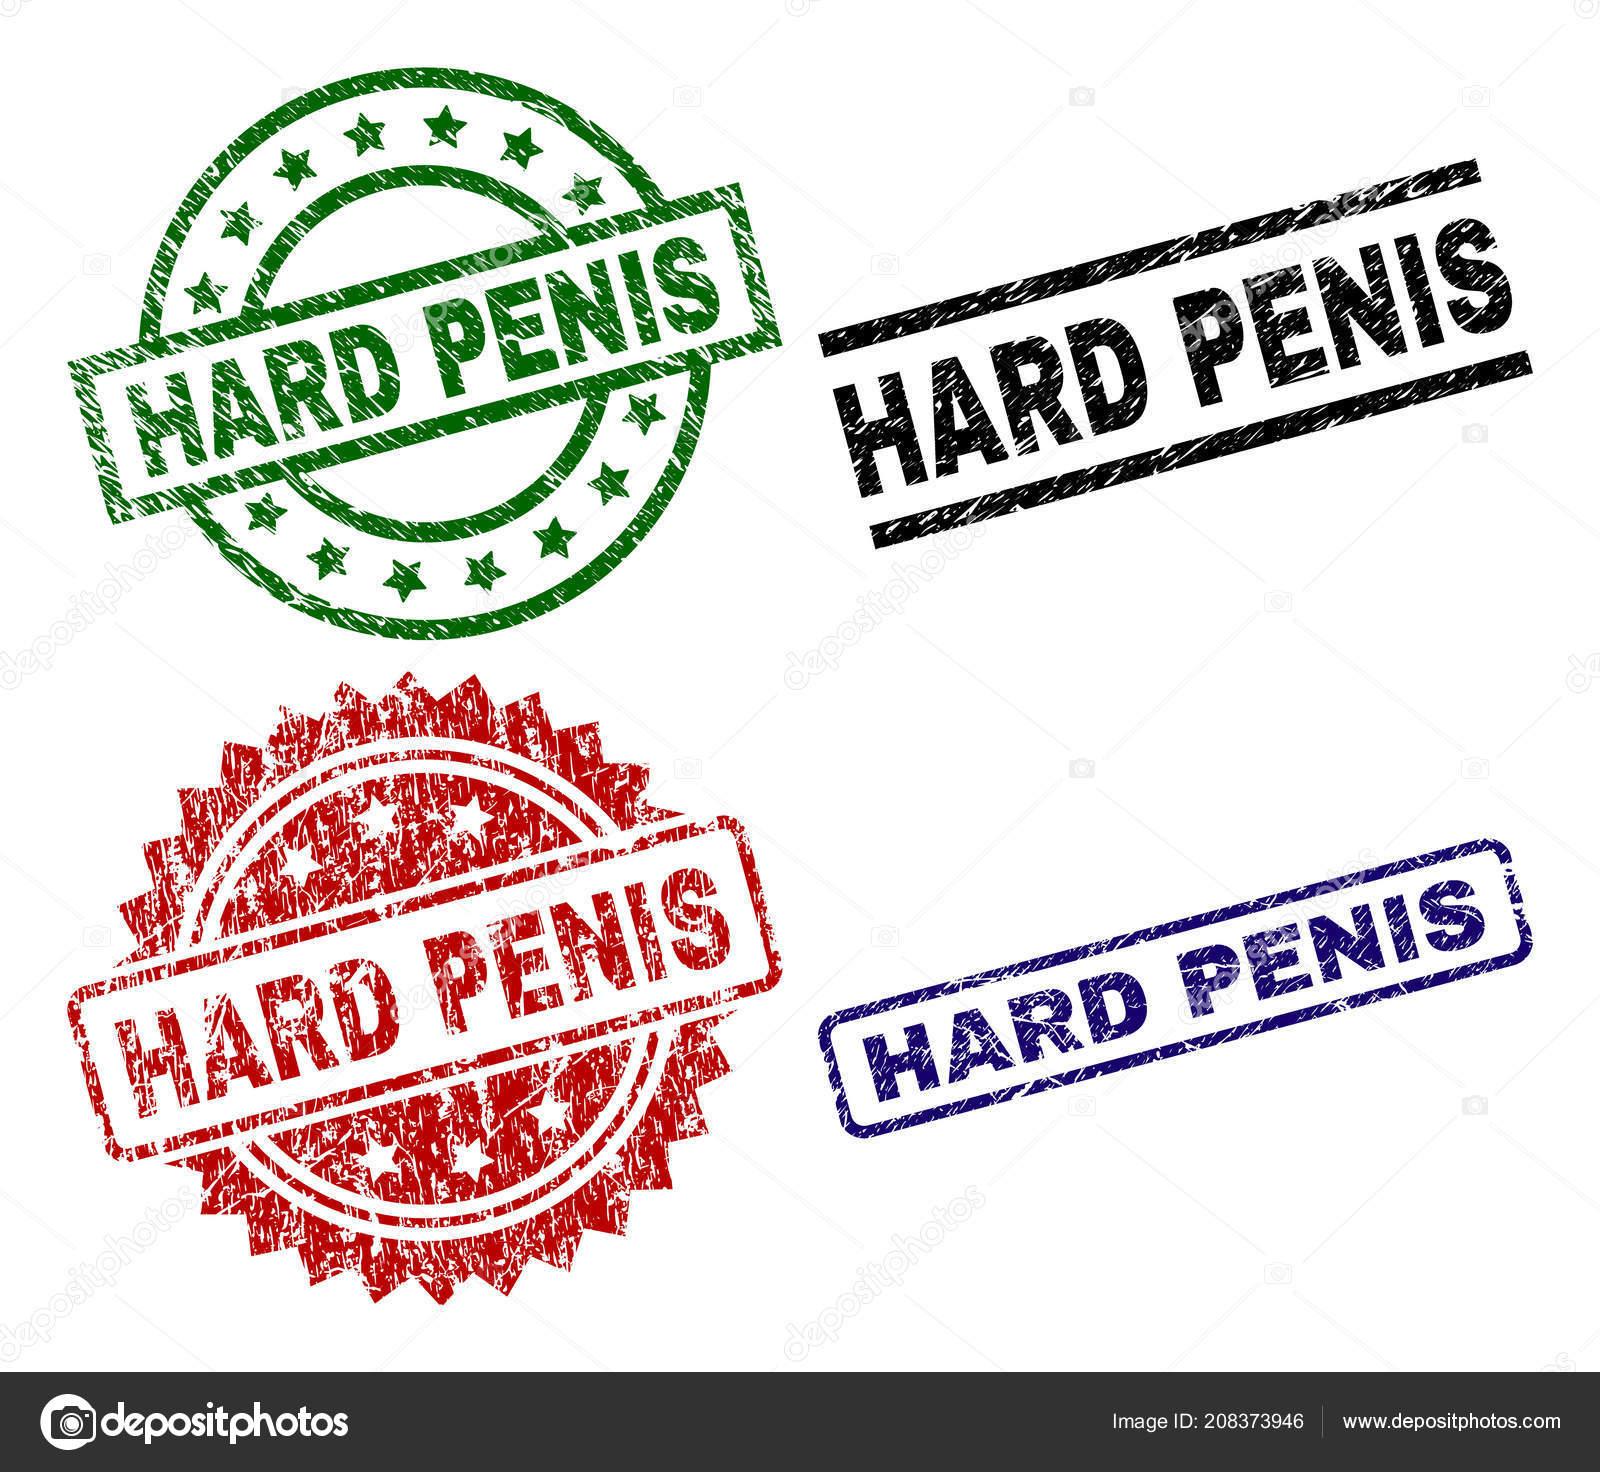 Bilder vom harten Penis